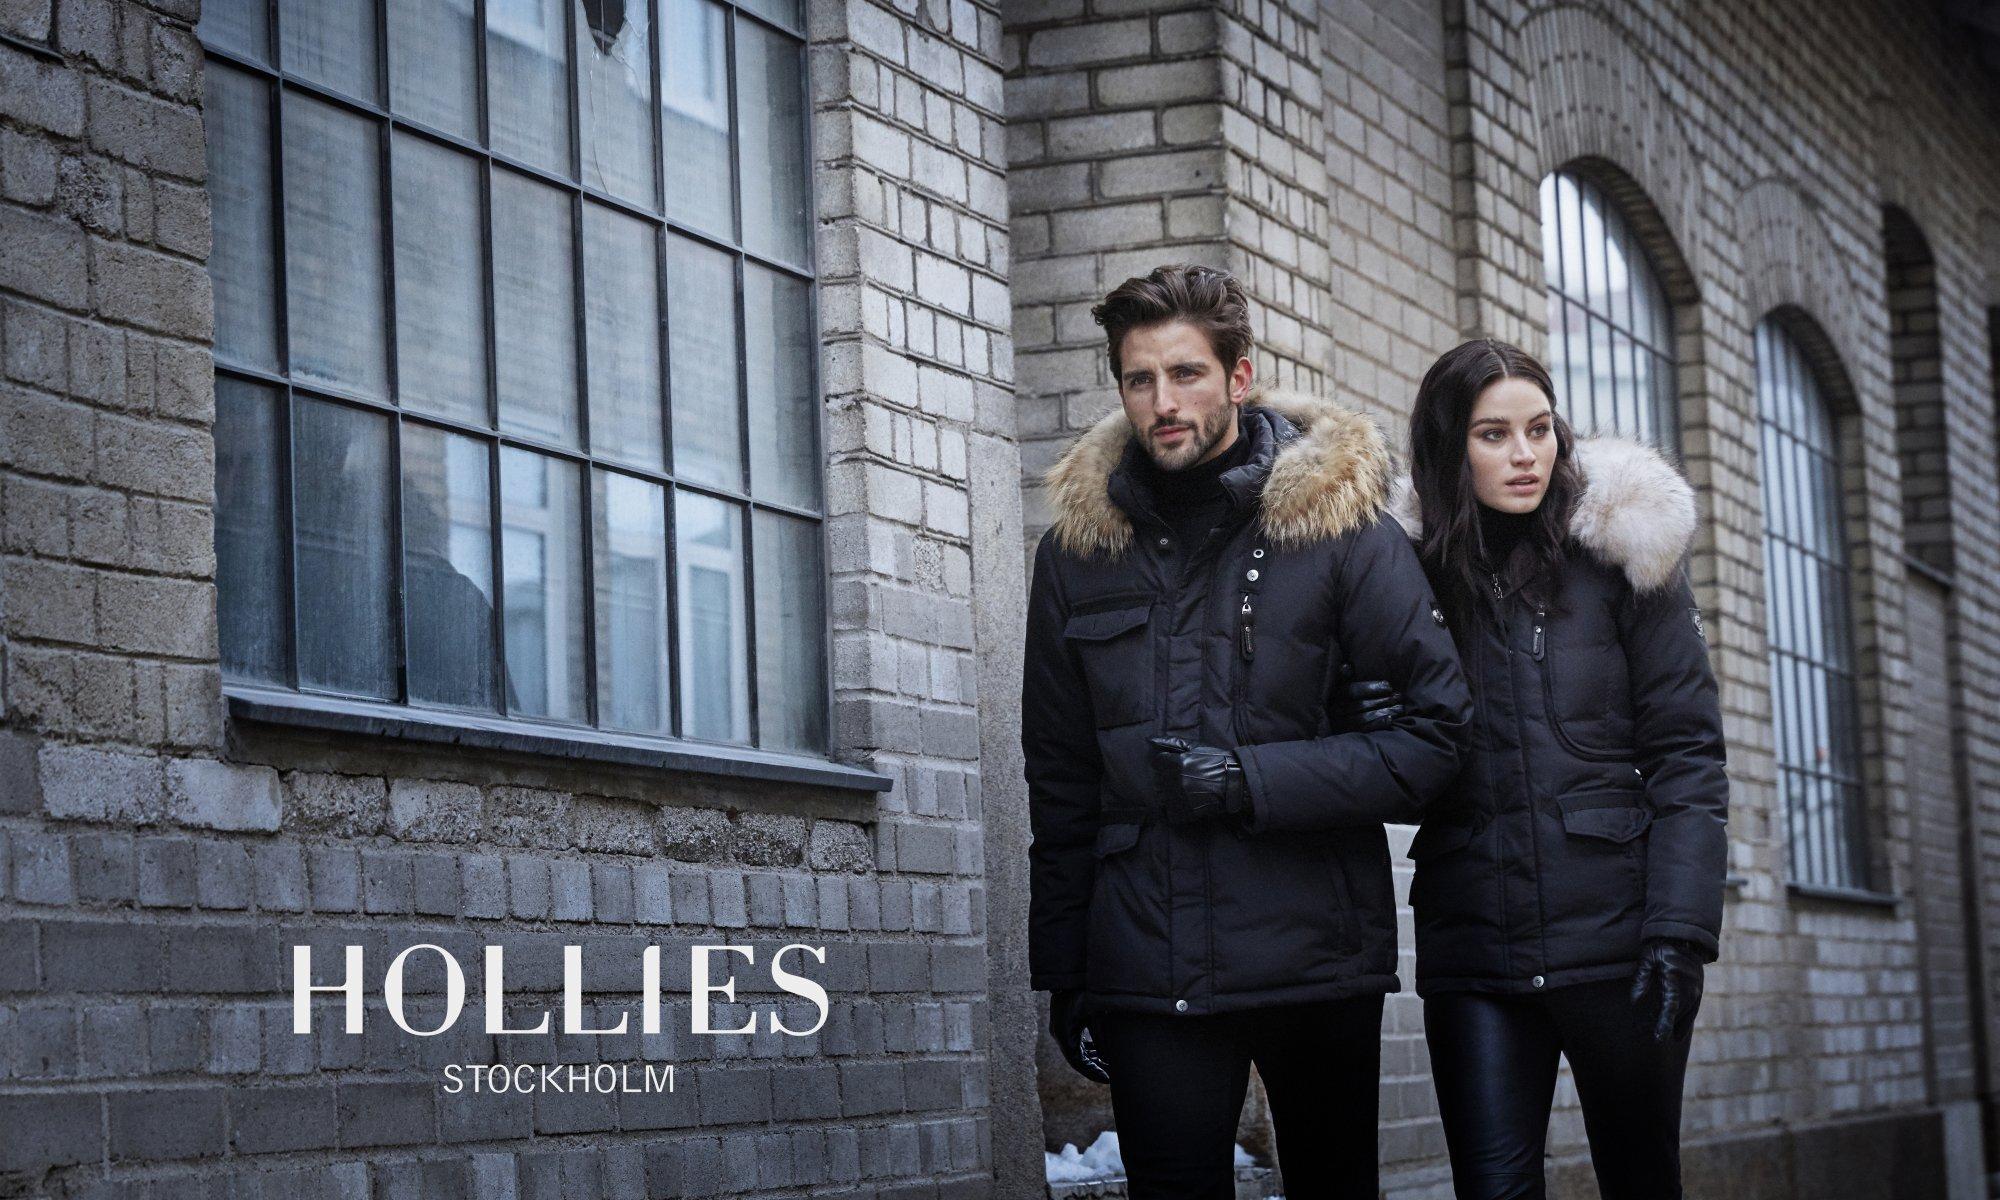 Hollies Stockholm